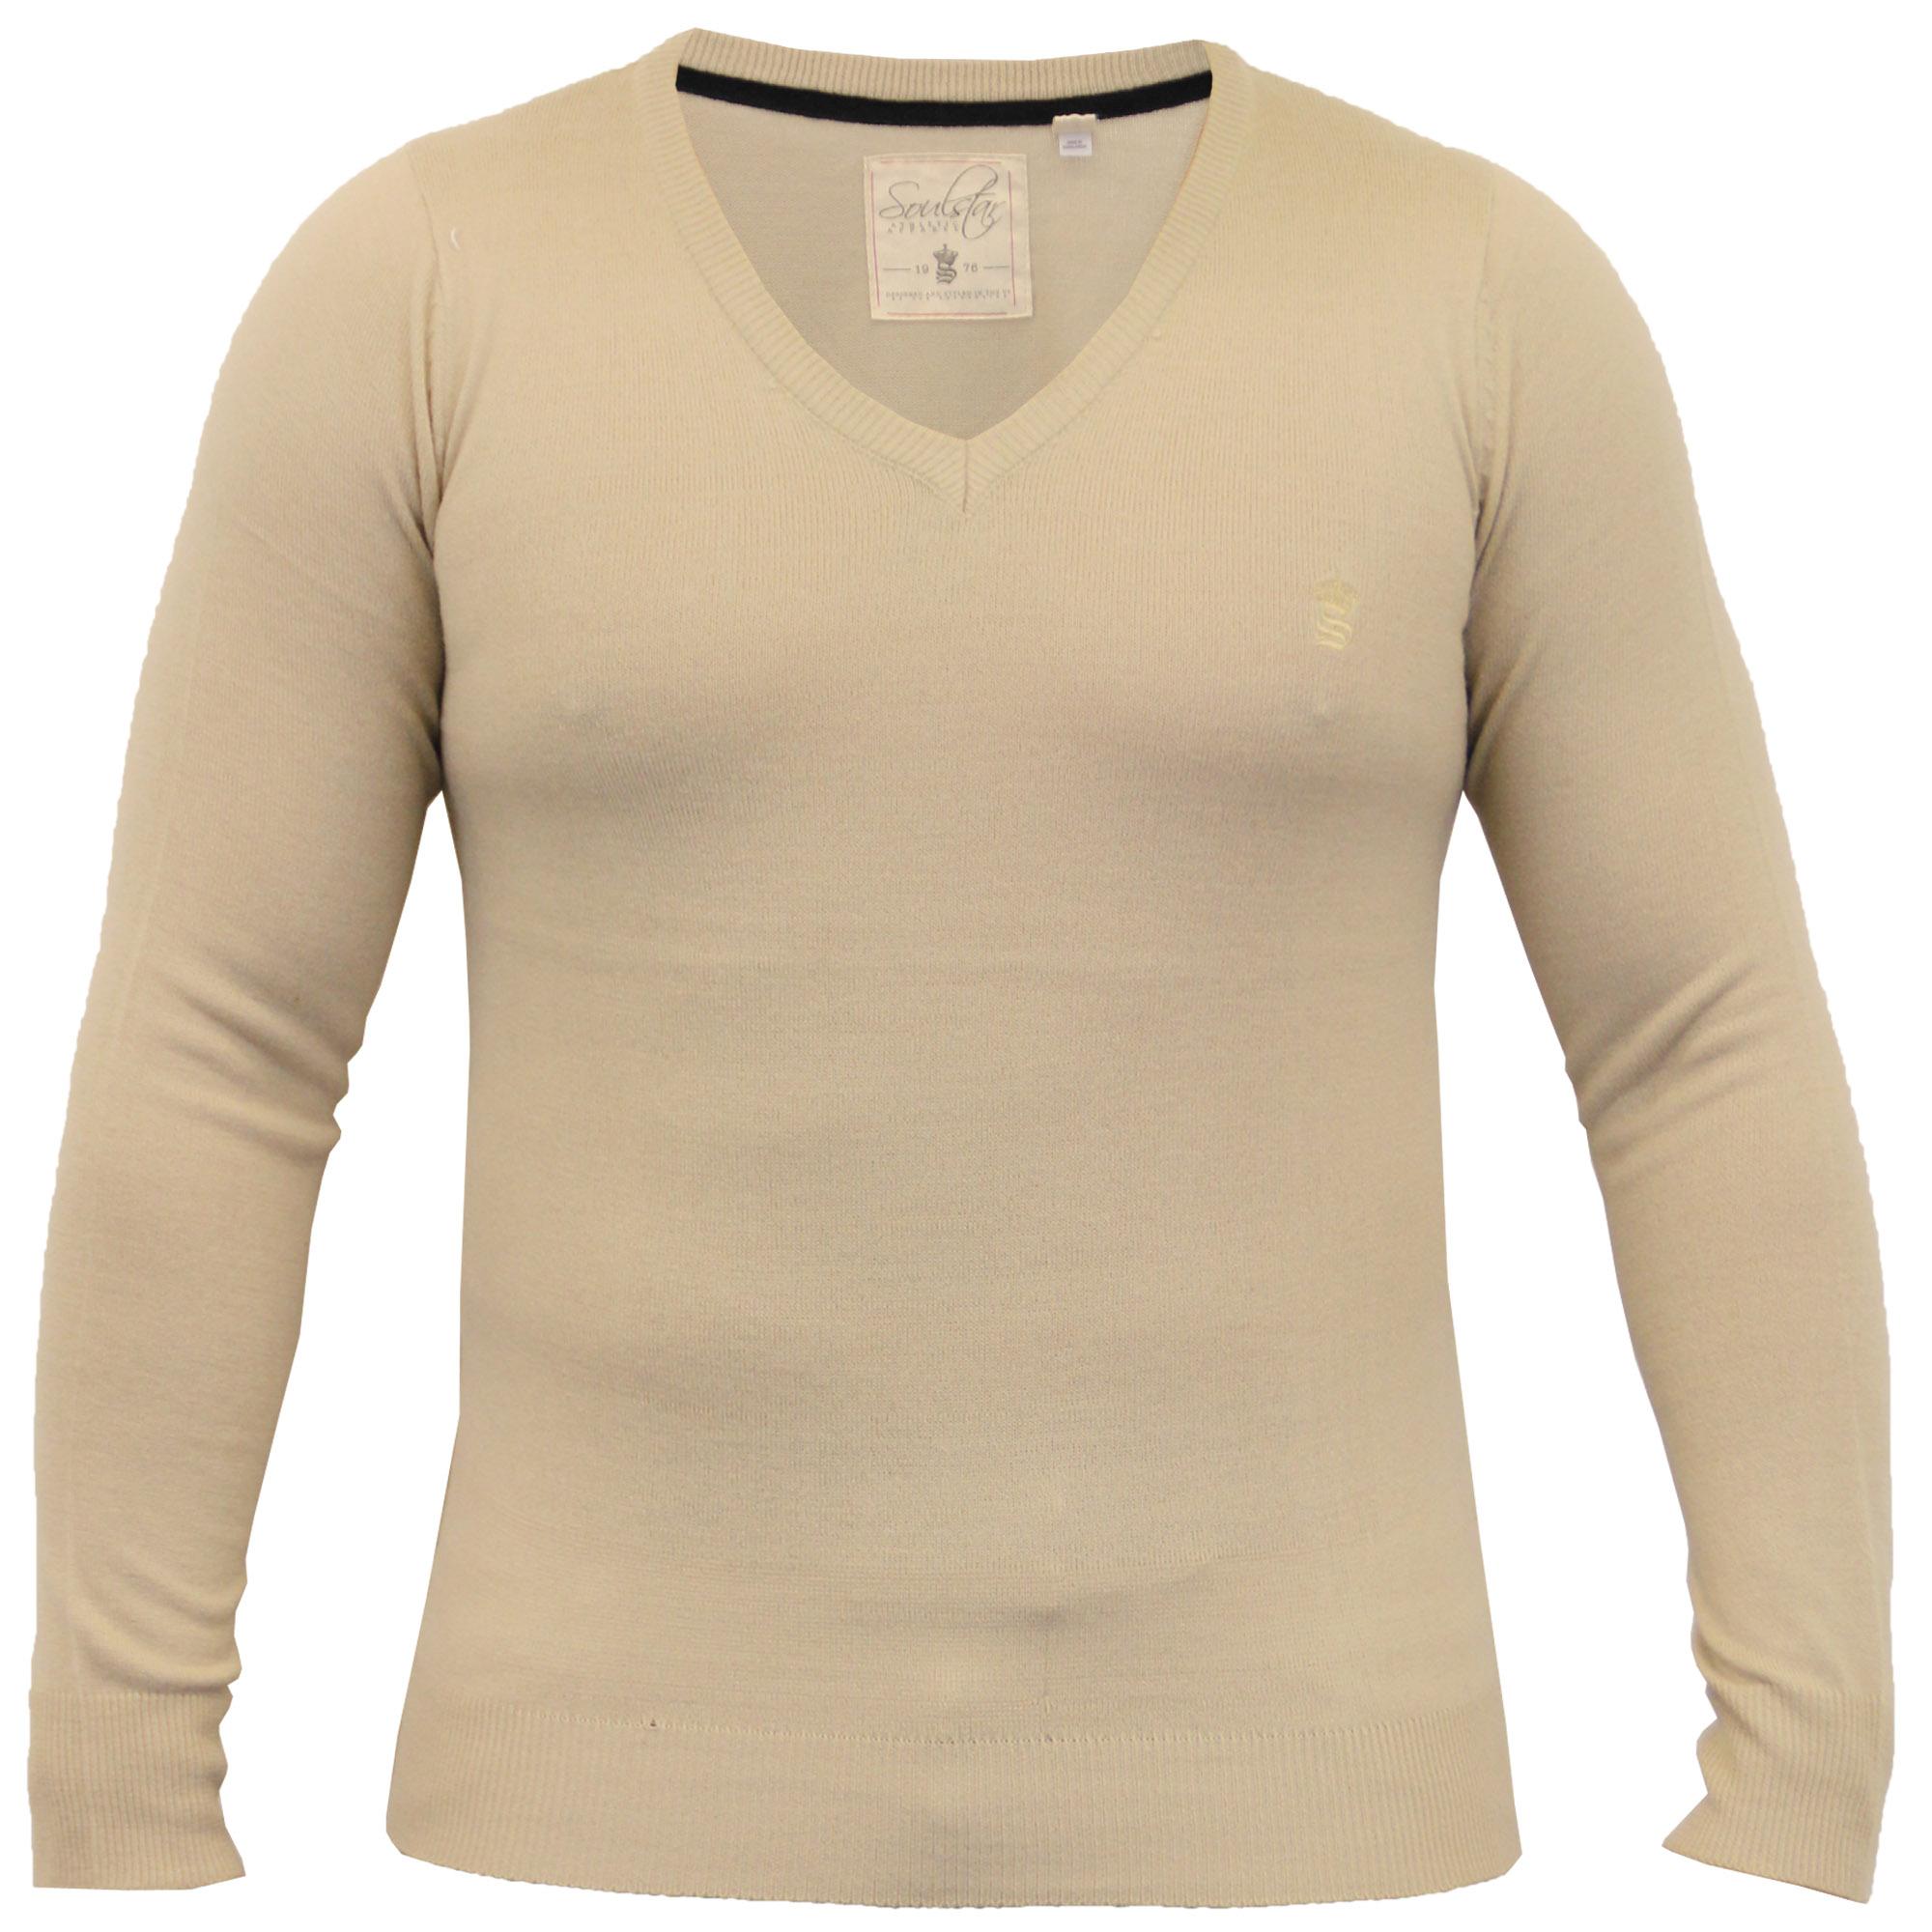 Mens-Jumper-Soul-Star-Knitted-Sweater-Pullover-Crew-V-Neck-Lightweight-Winter thumbnail 11